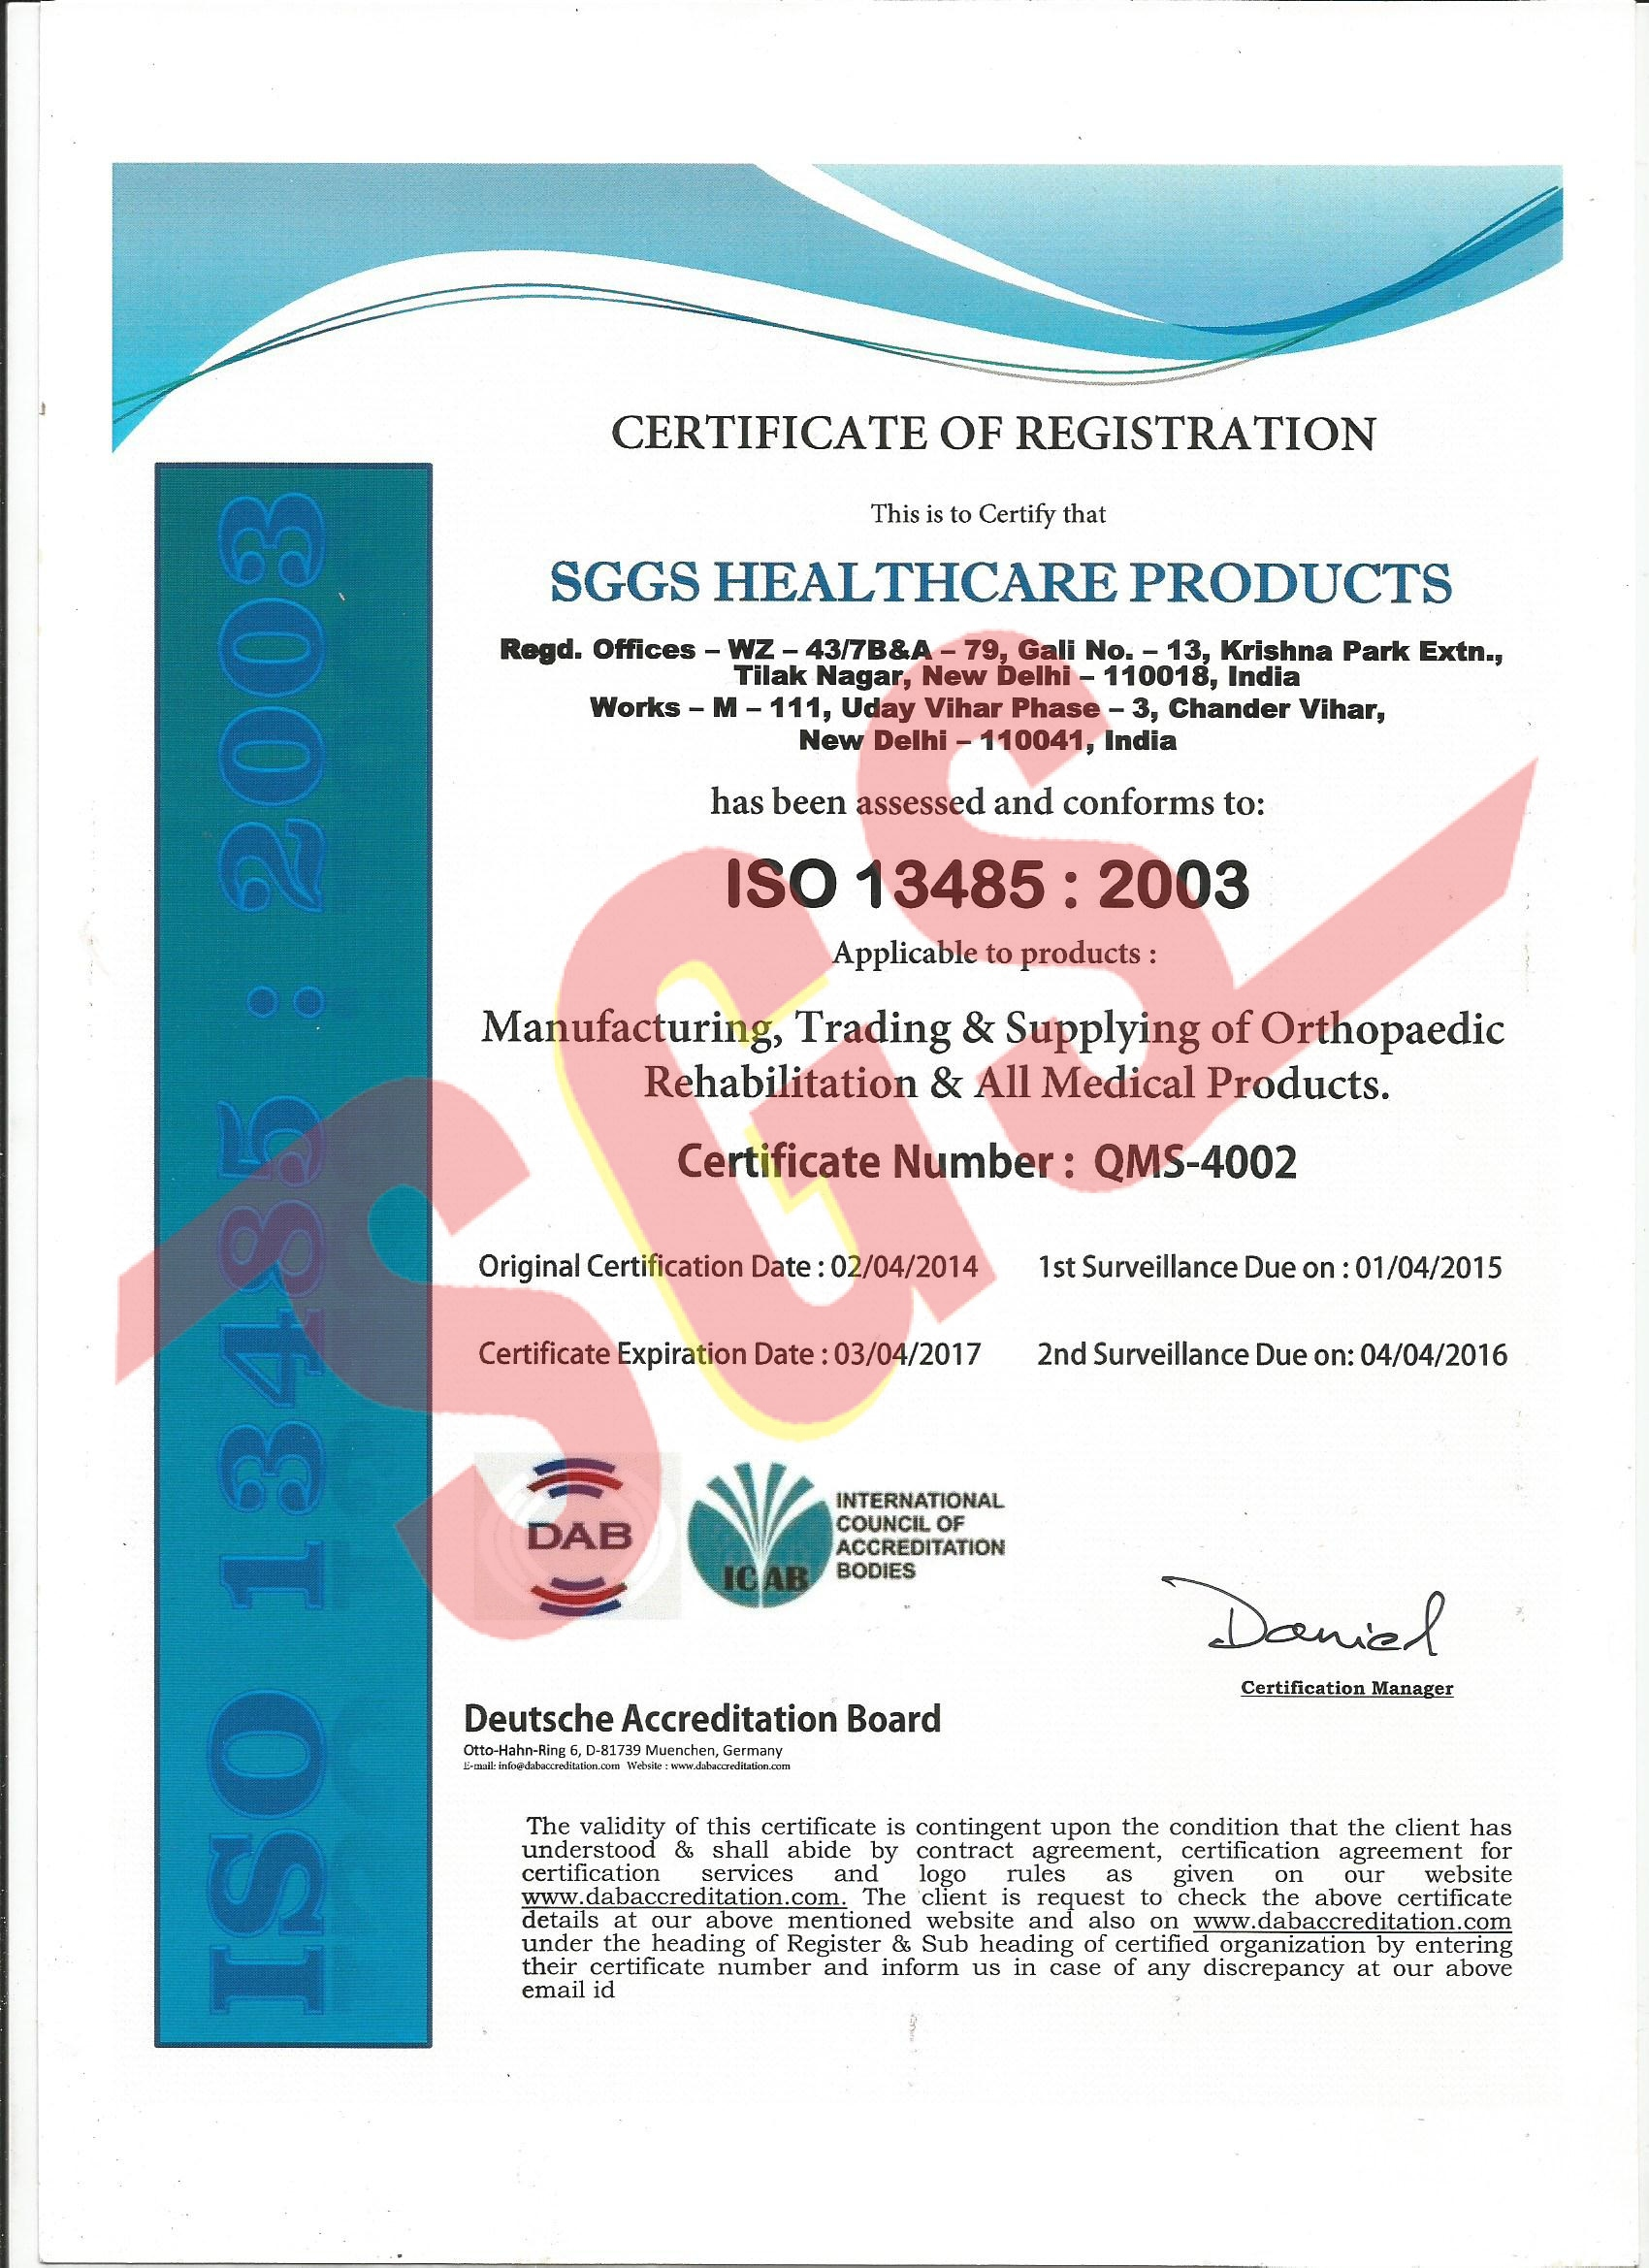 Cert 13485 - 2003